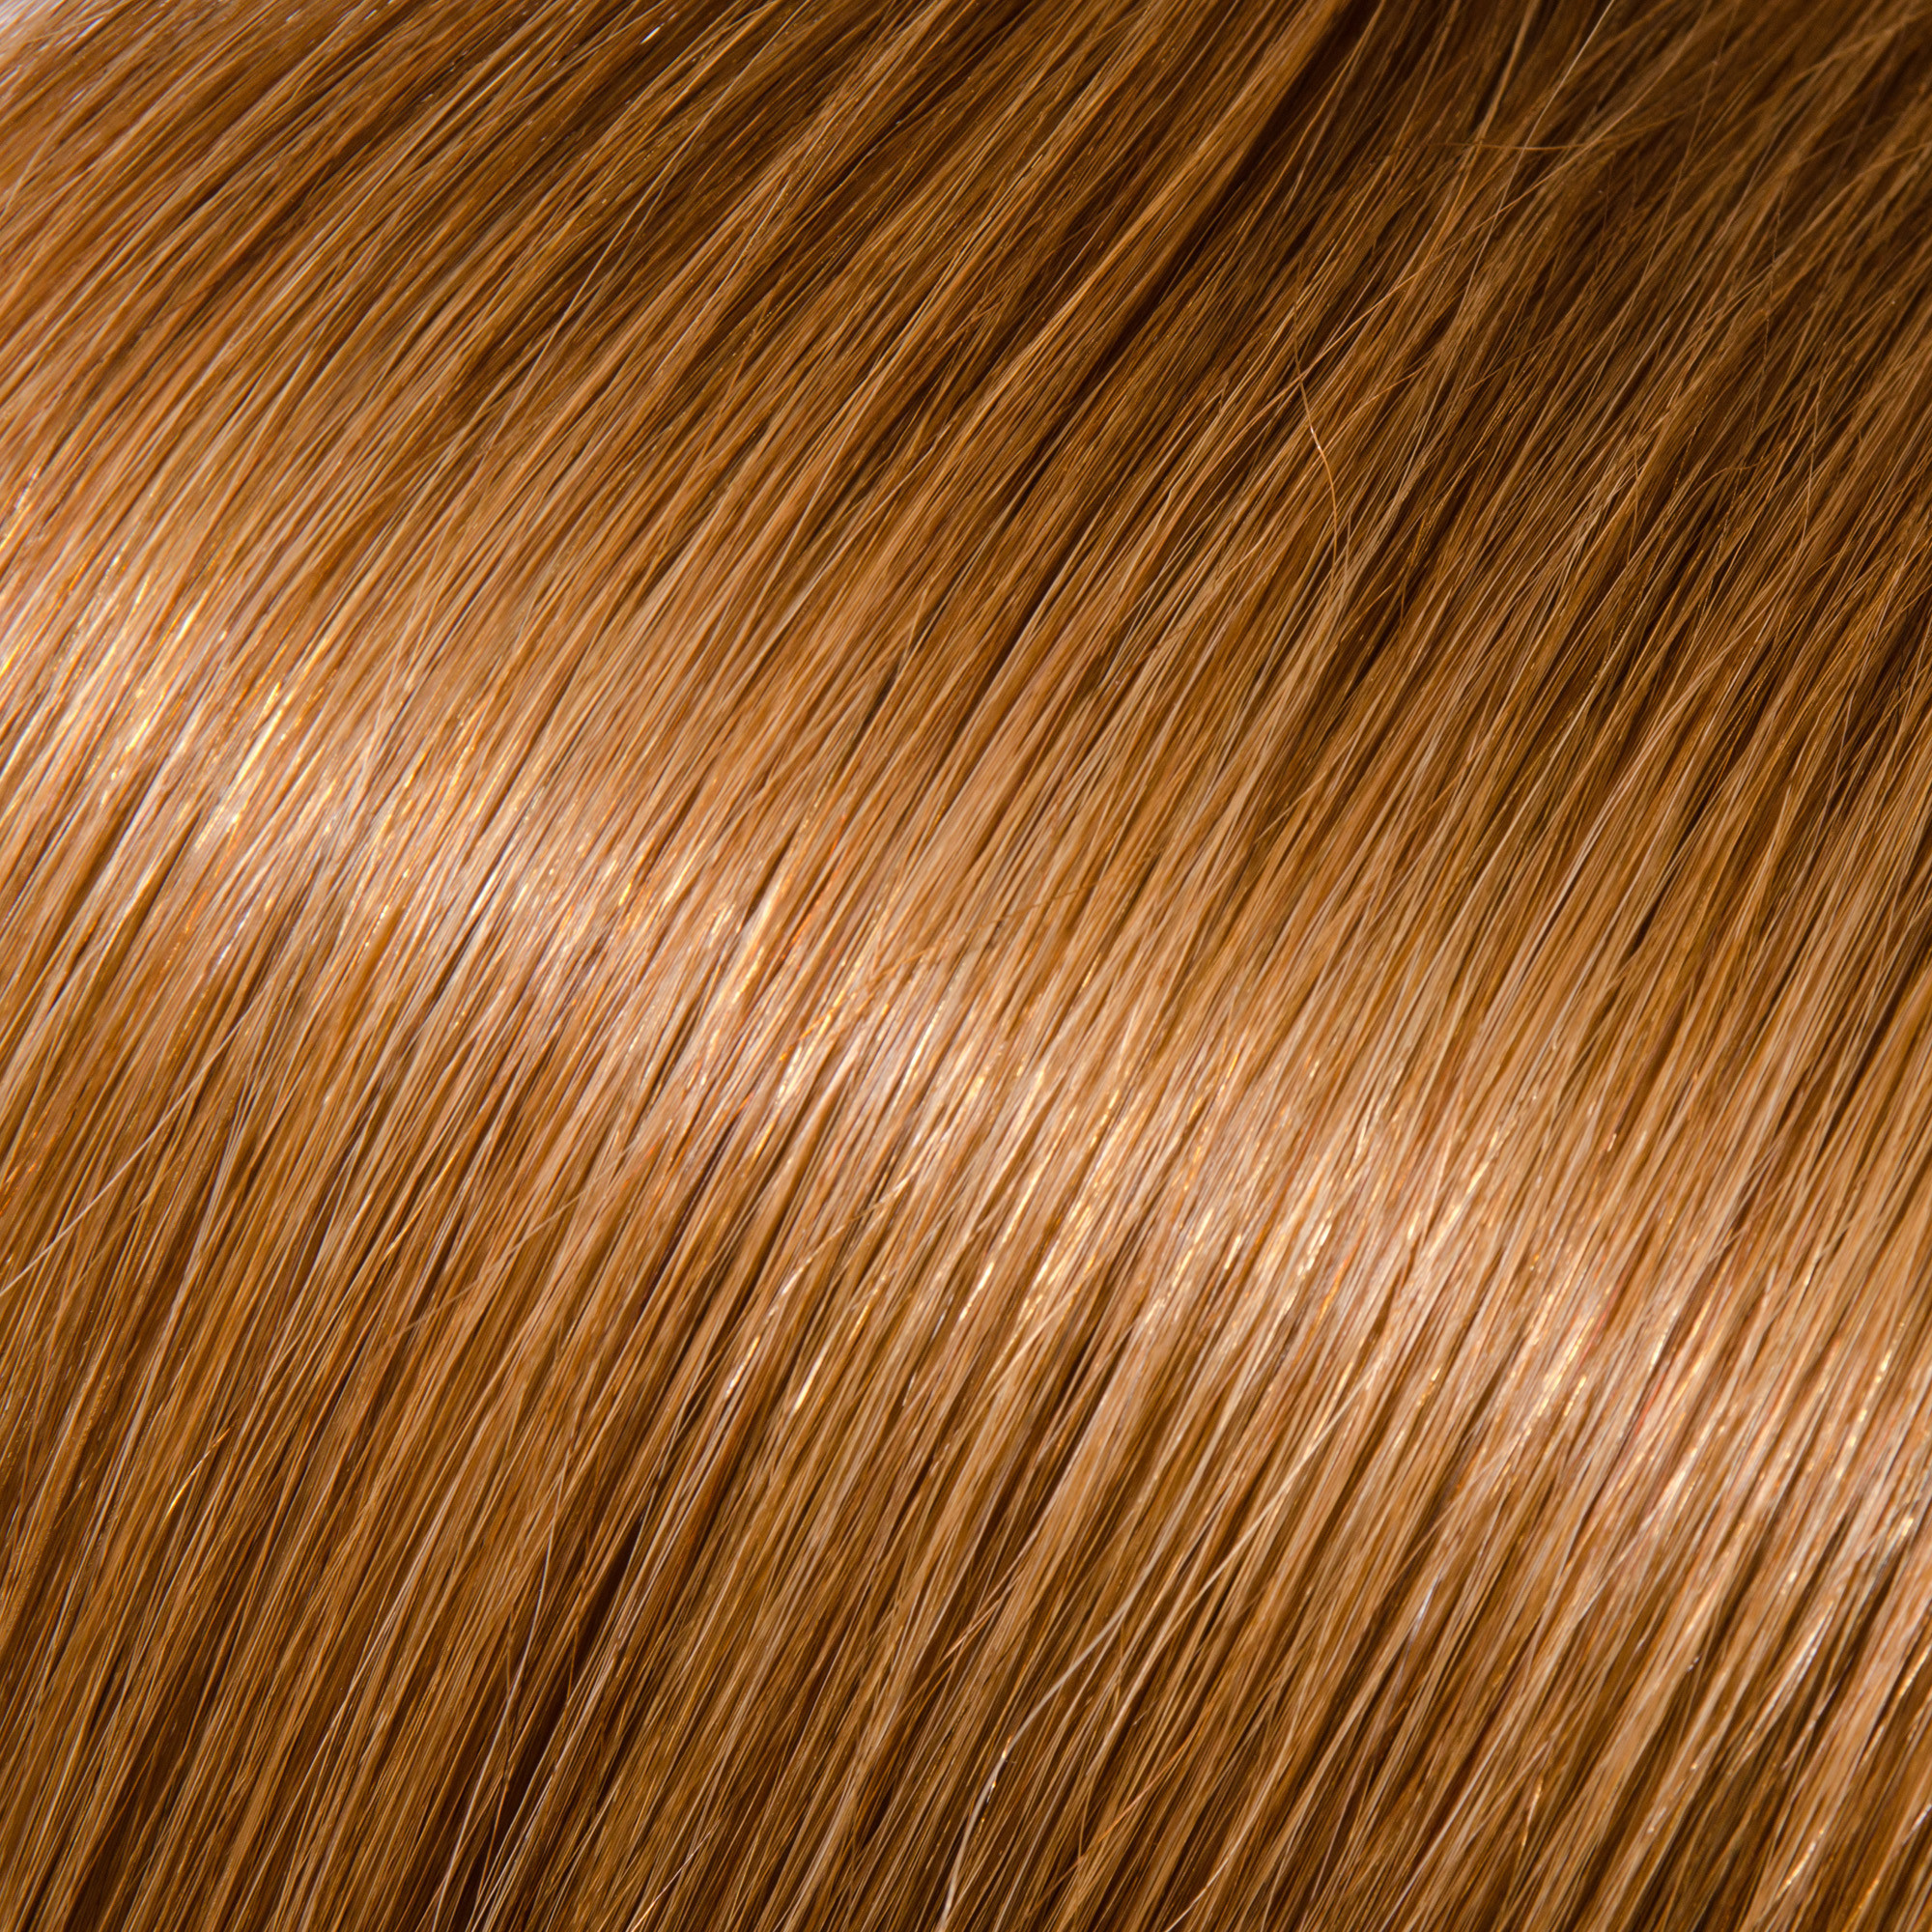 رنگ مو jev